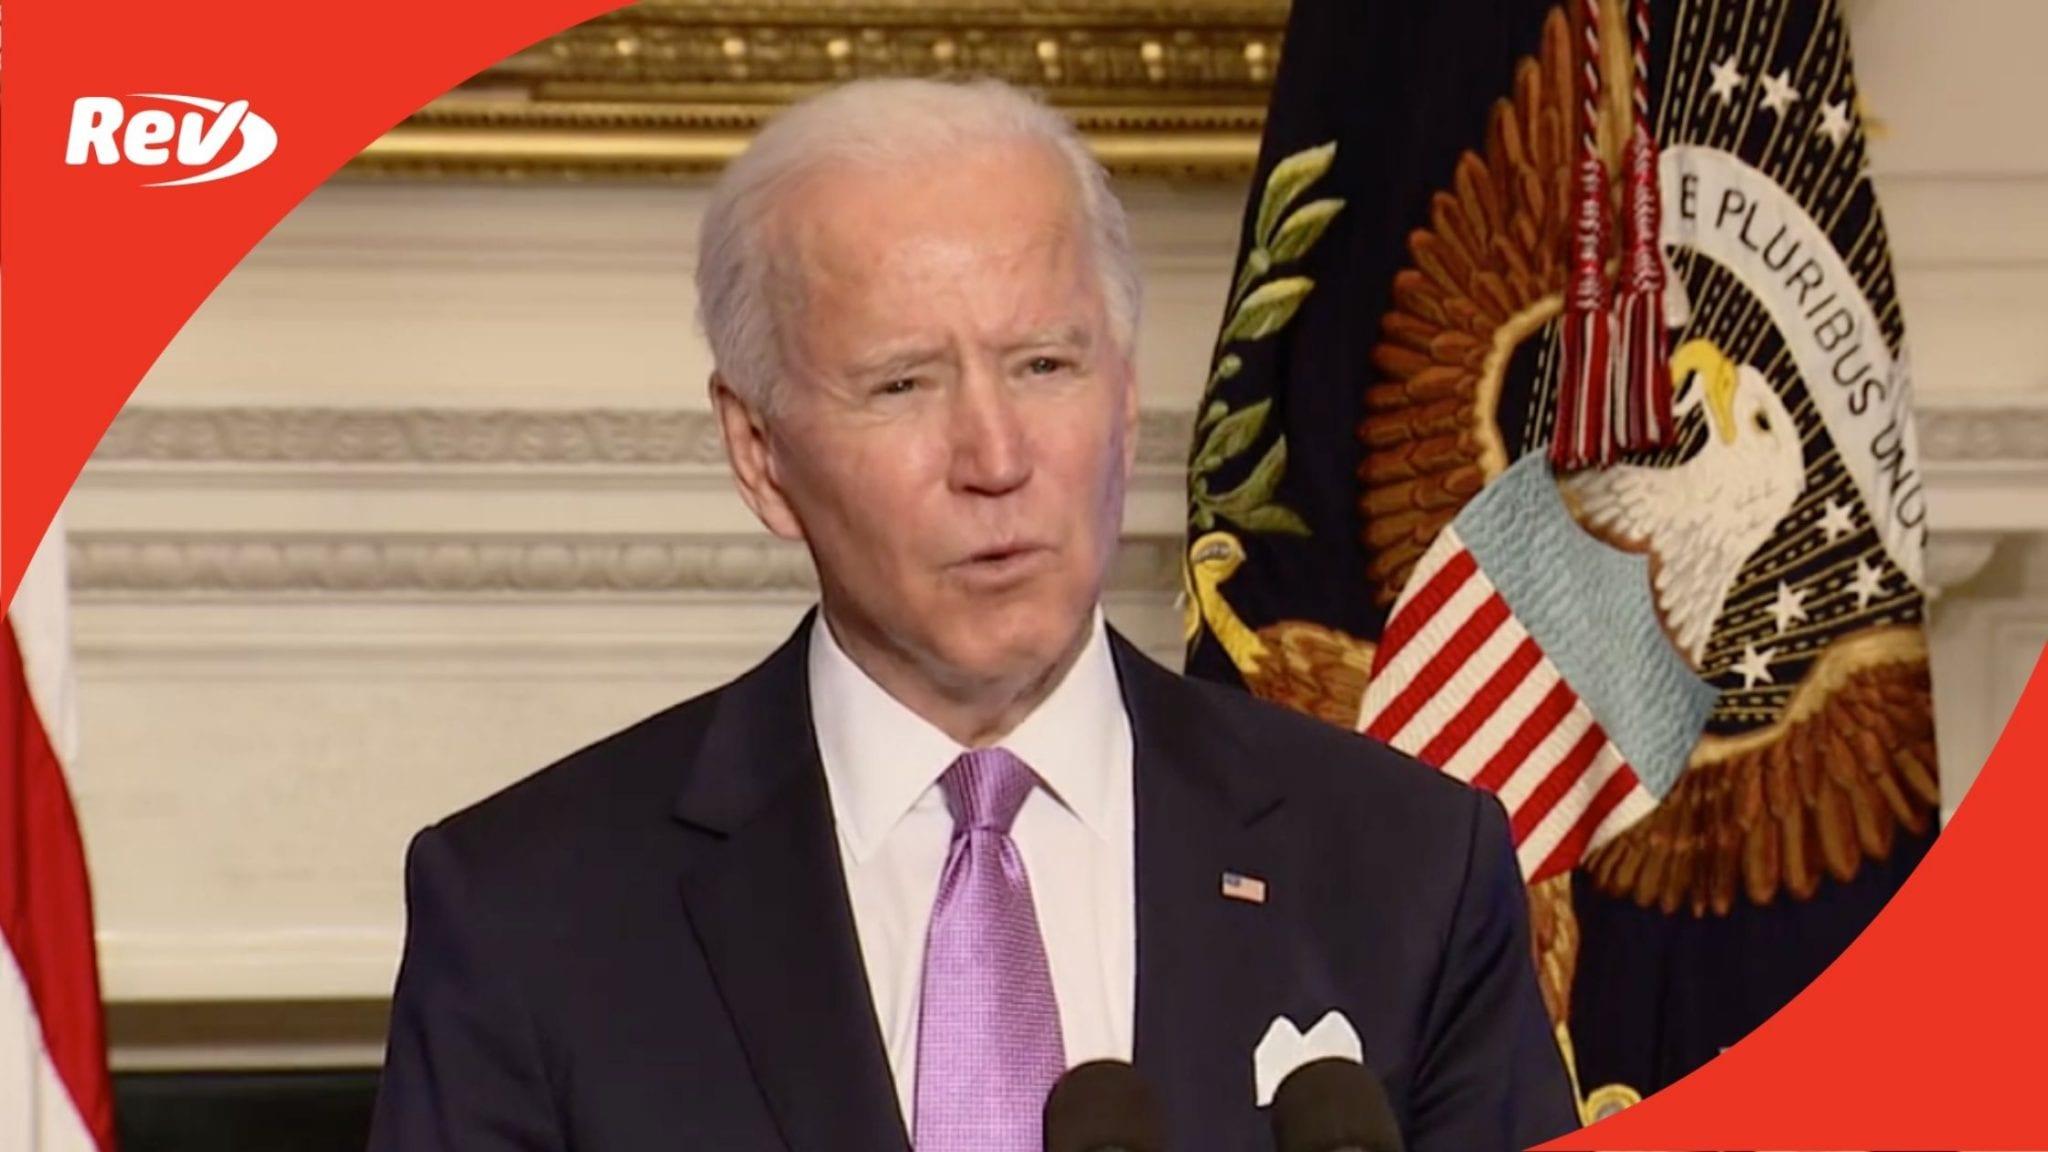 Joe Biden Press Conference on COVID-19 & Vaccine Distribution Transcript January 26